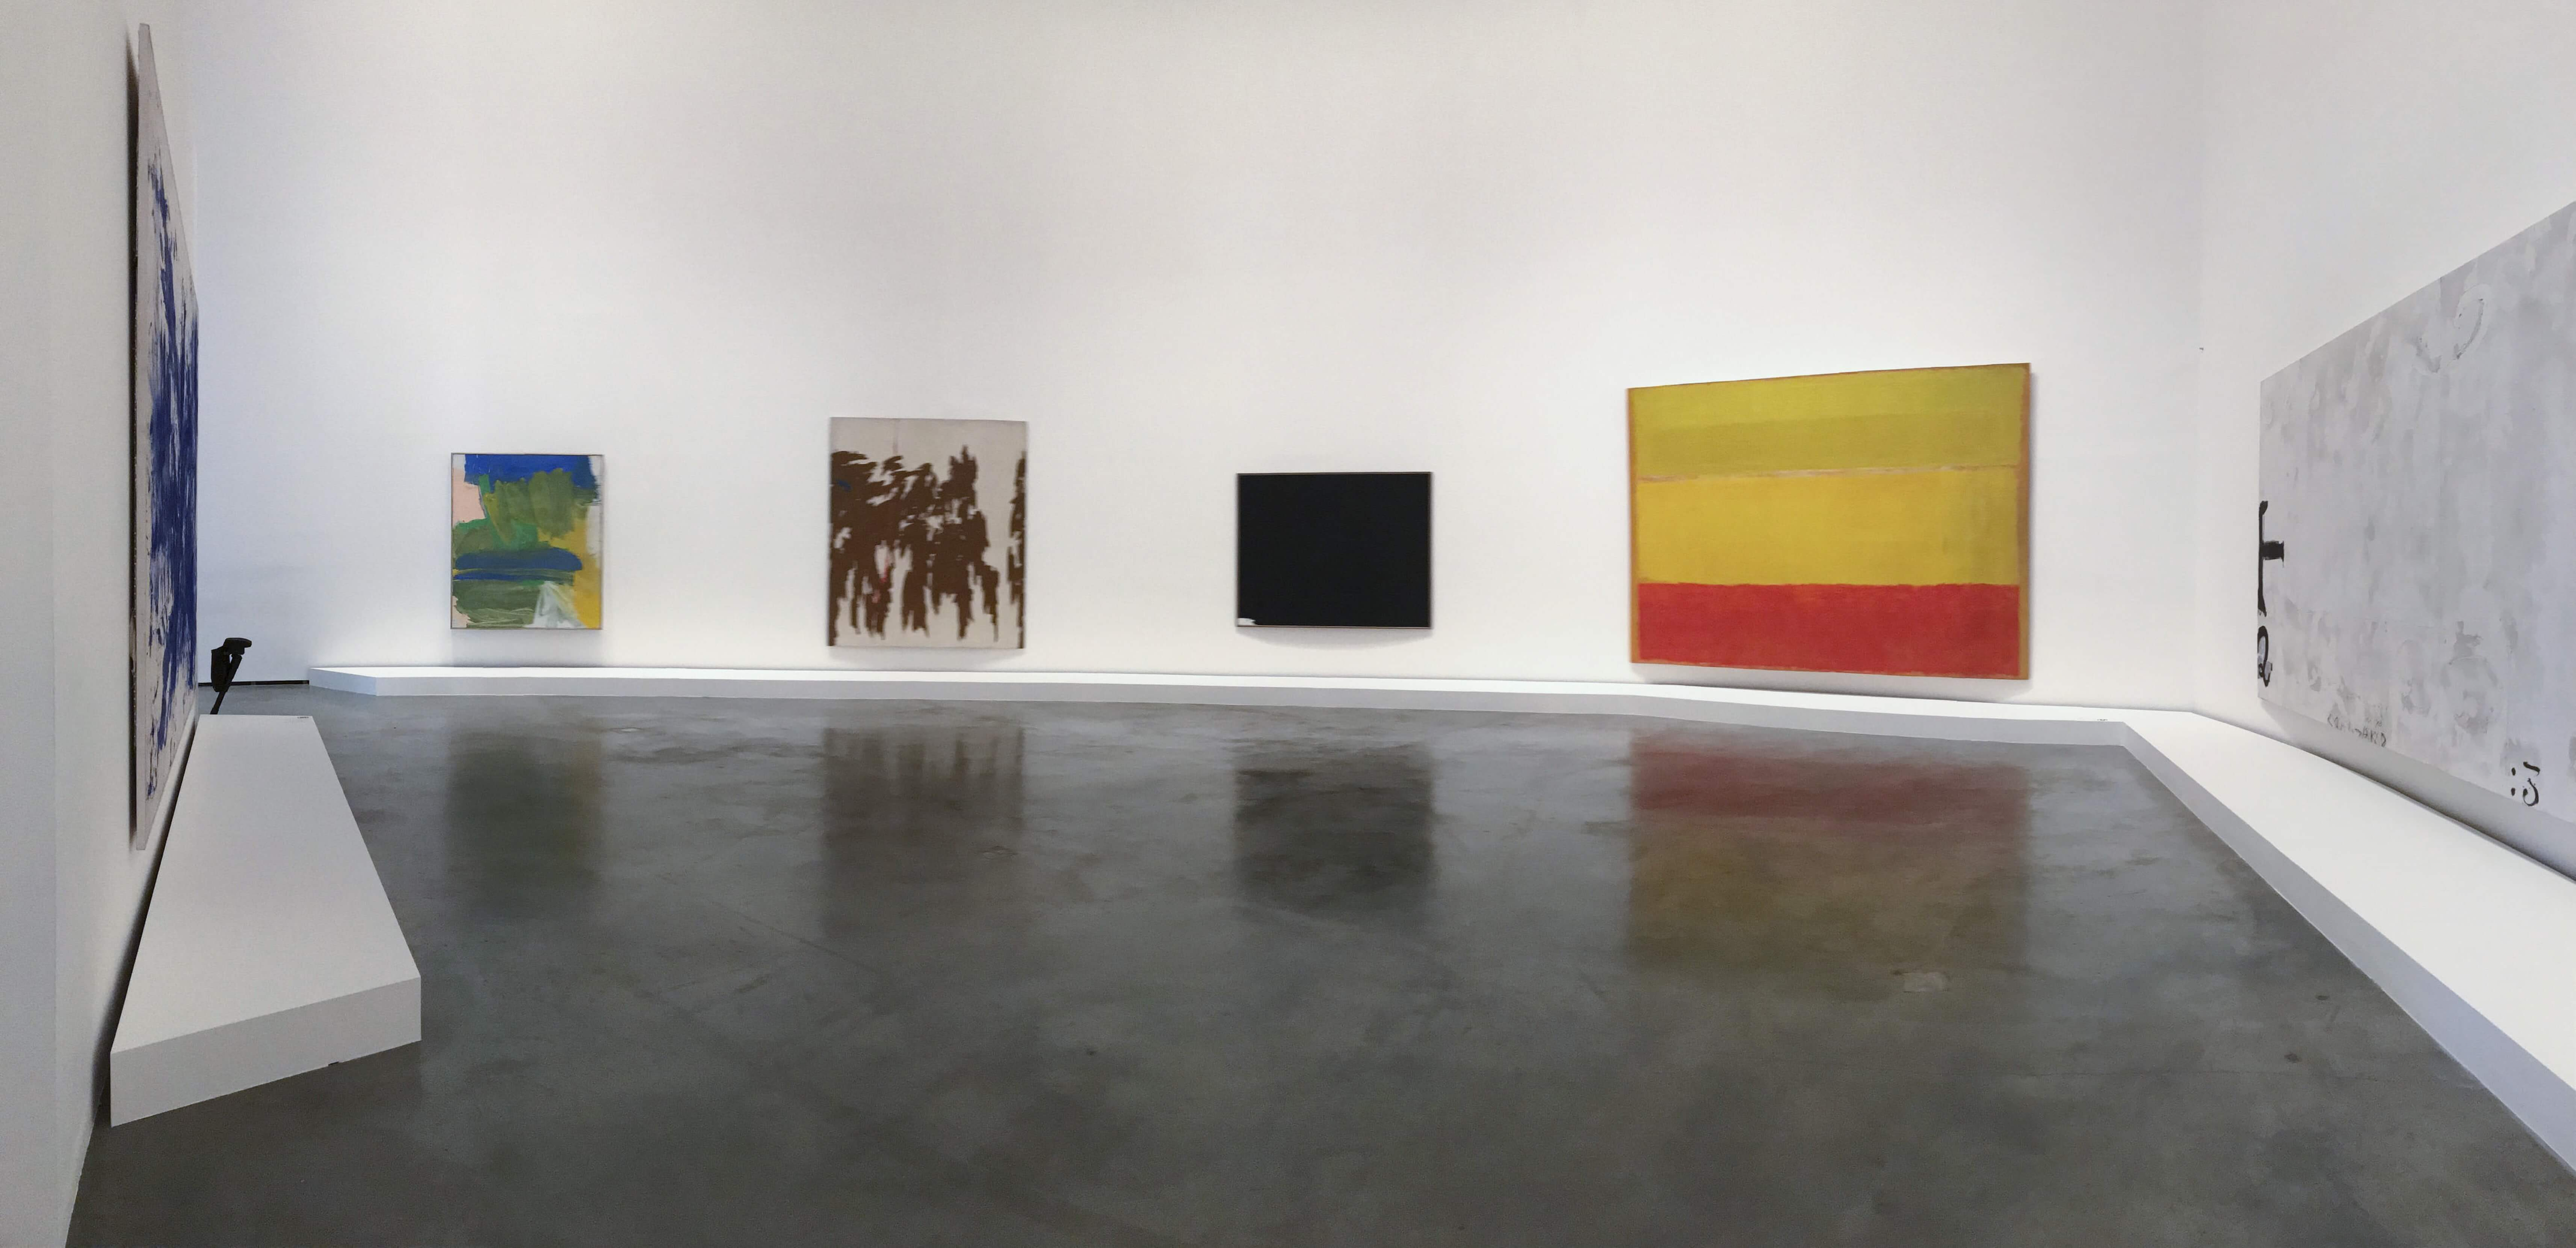 Sans titre | Mark Rothko | Guggenheim Bilbao Museoa